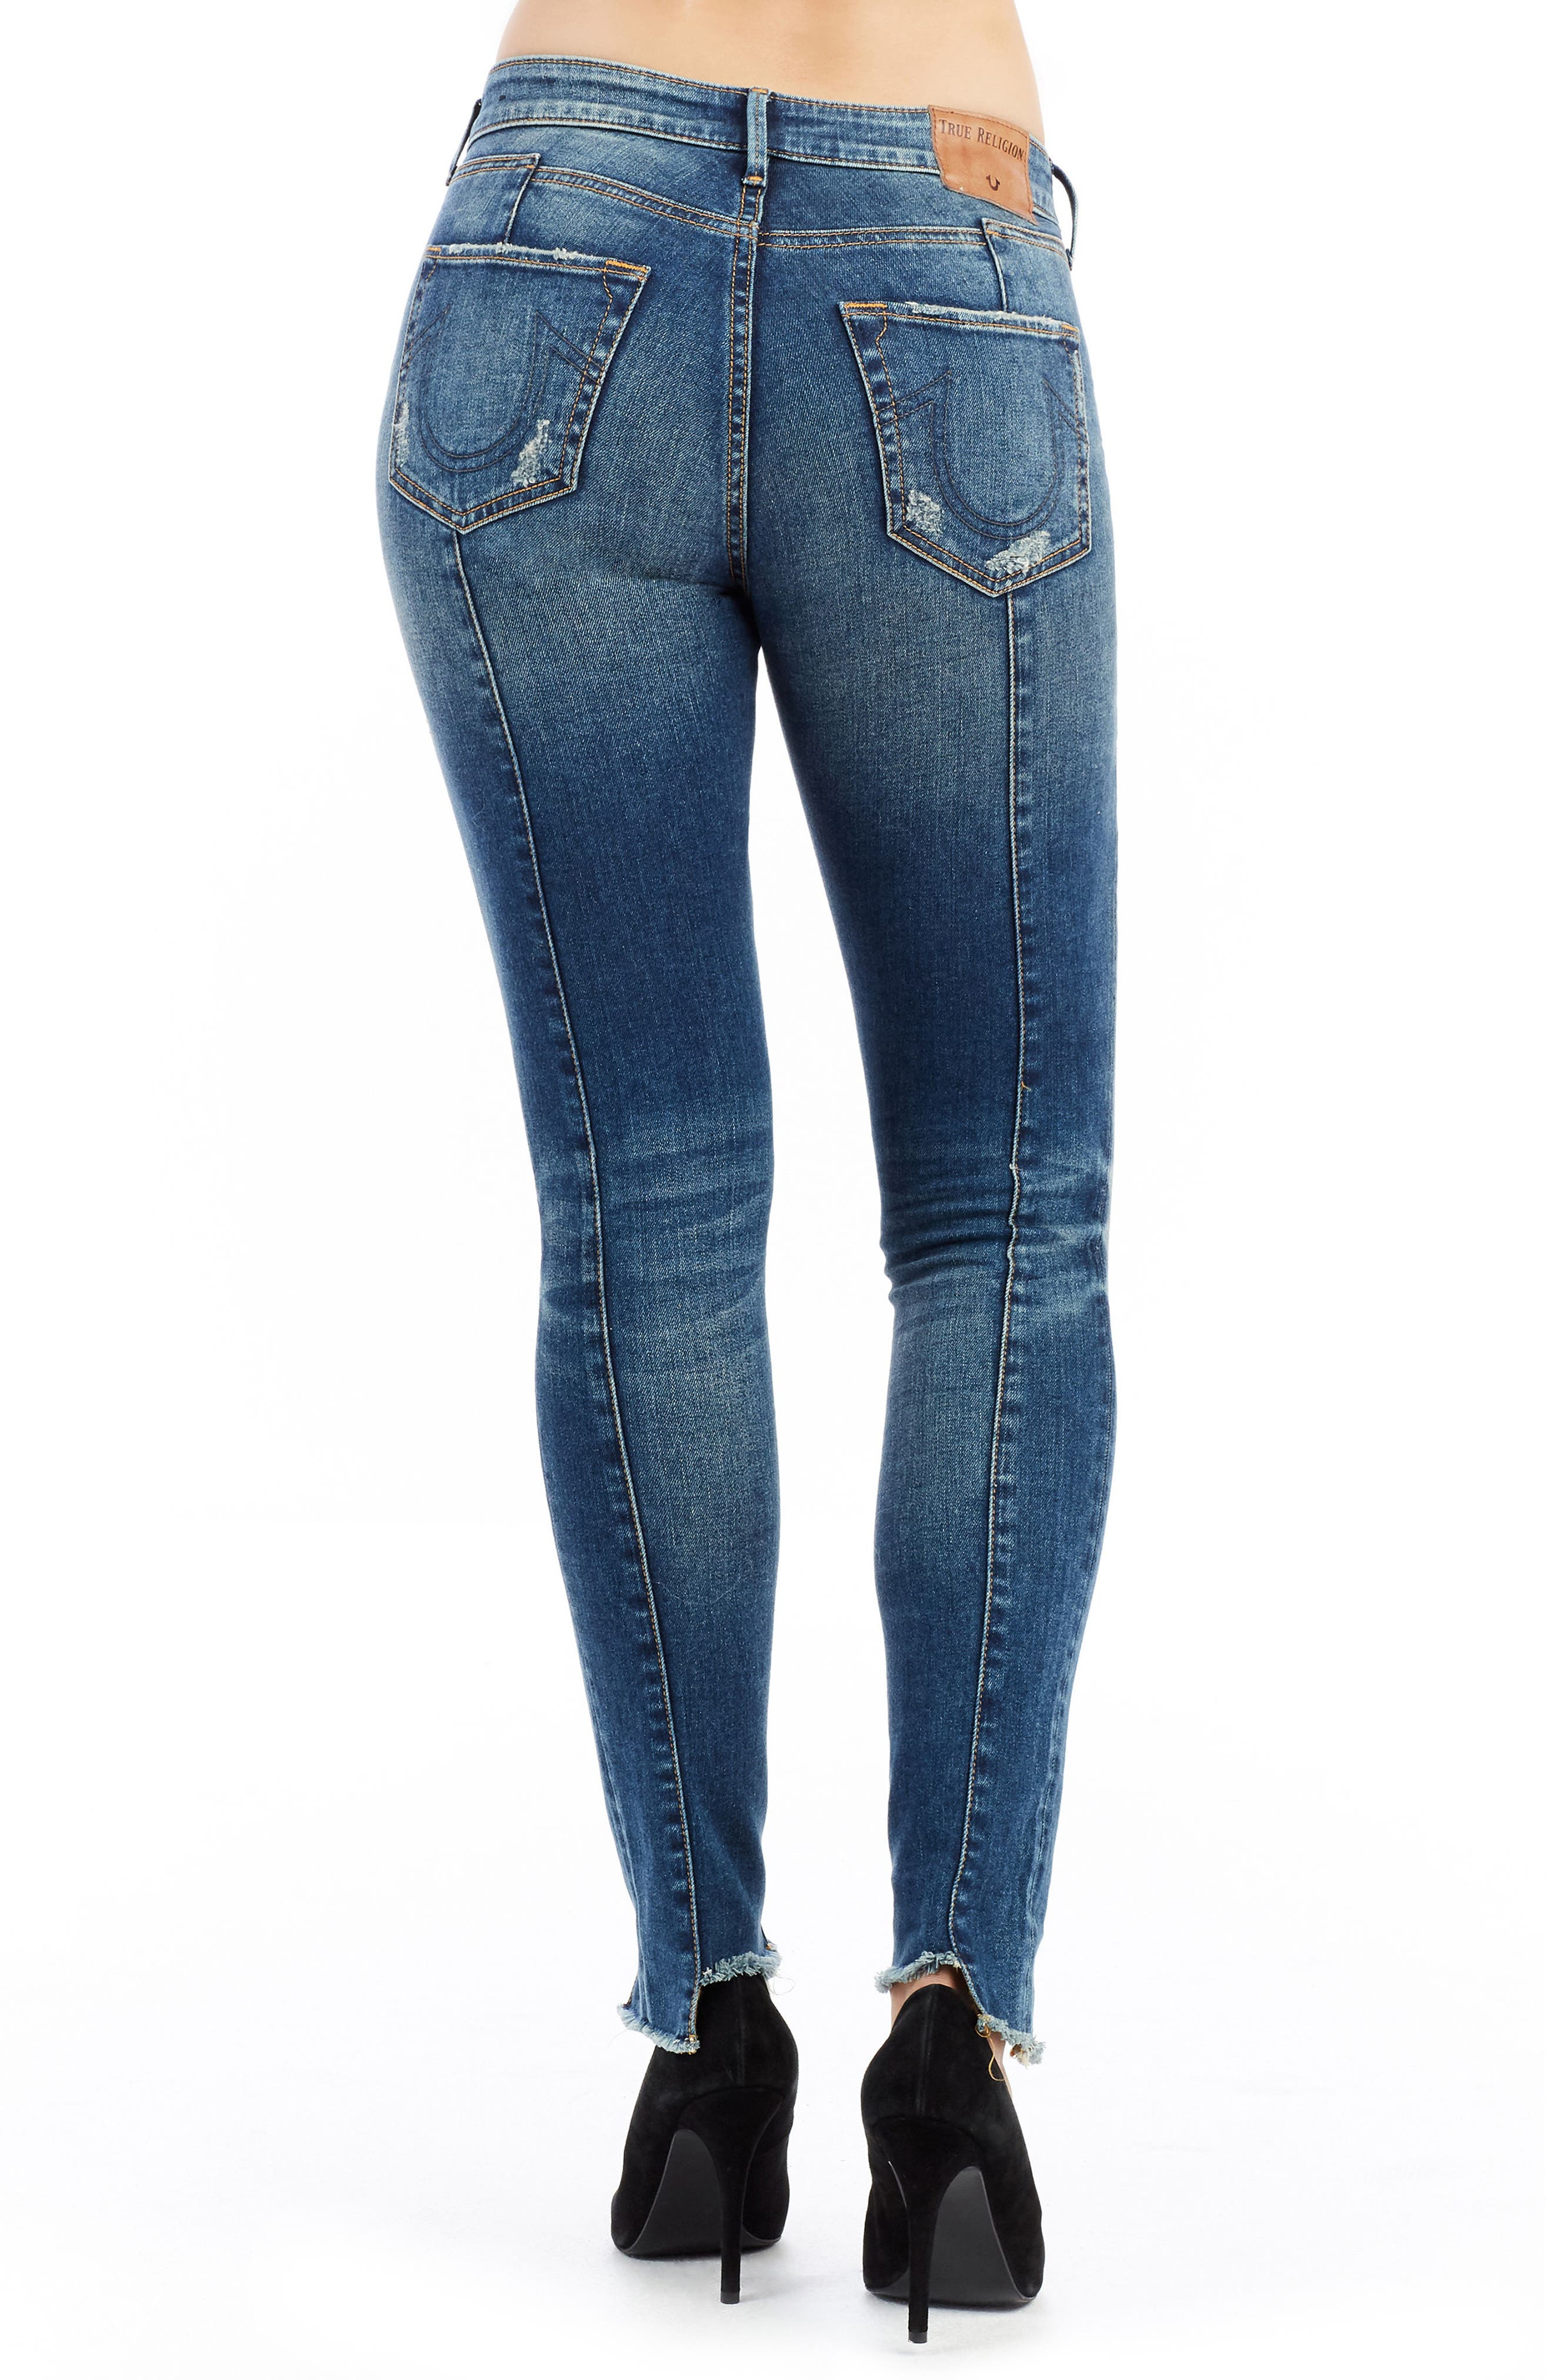 Jennie Curvy Skinny Jeans,                             Alternate thumbnail 2, color,                             400